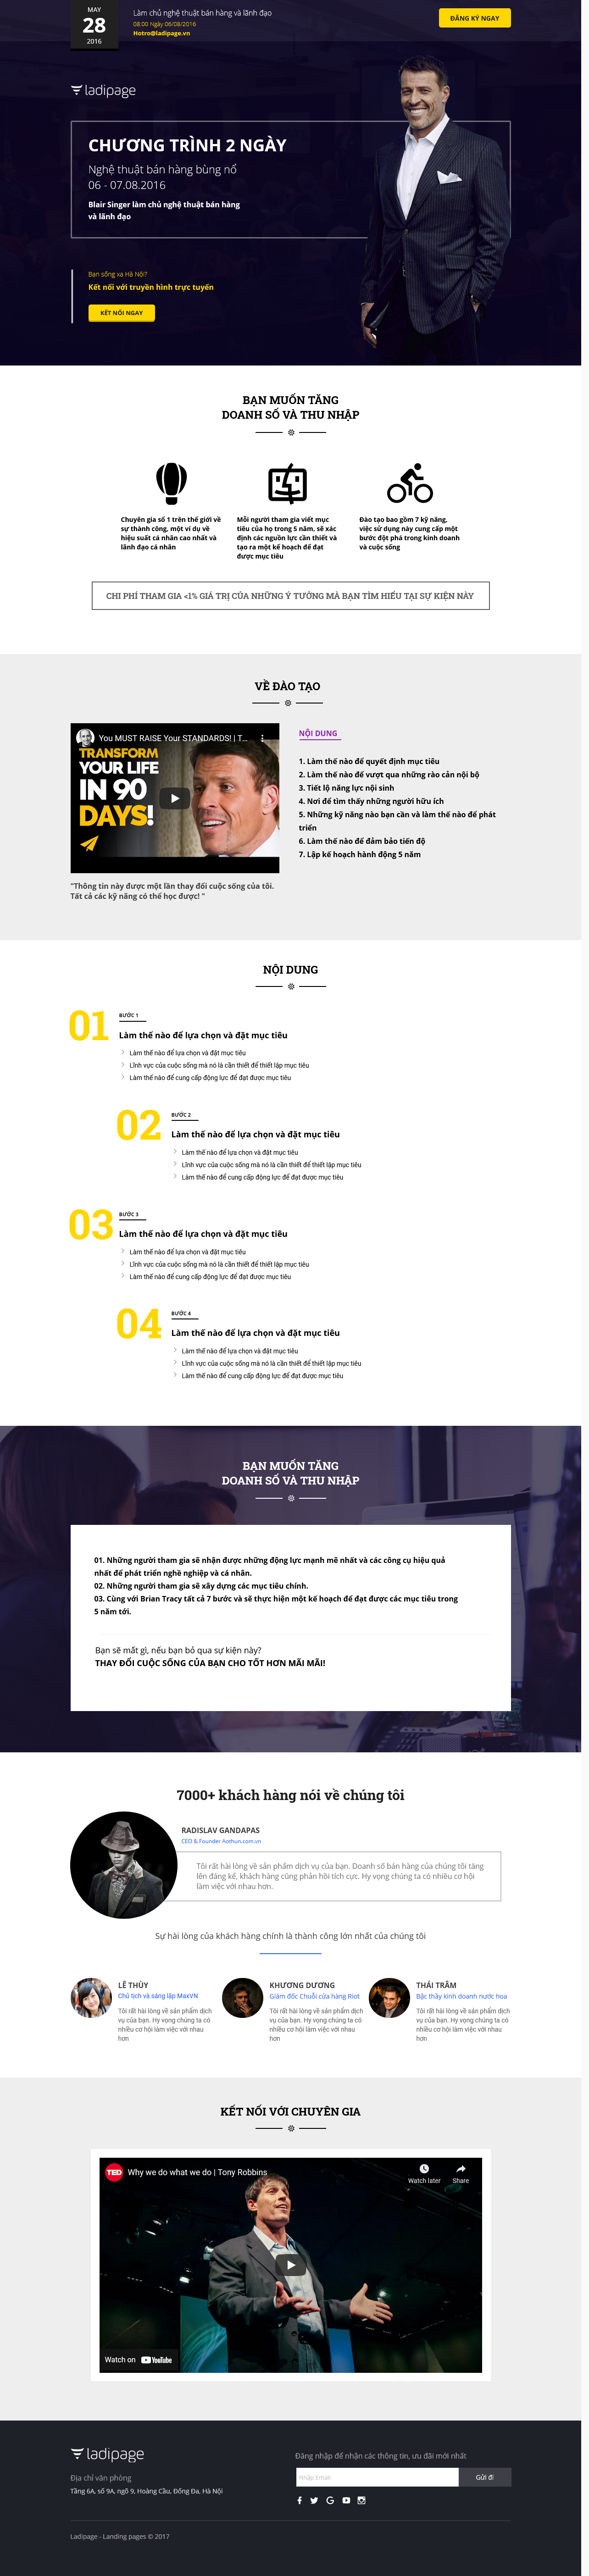 Thiết kế website Thiết kế webiste landingpage su-kien---hoi-thao Tổ chức sự kiện 01